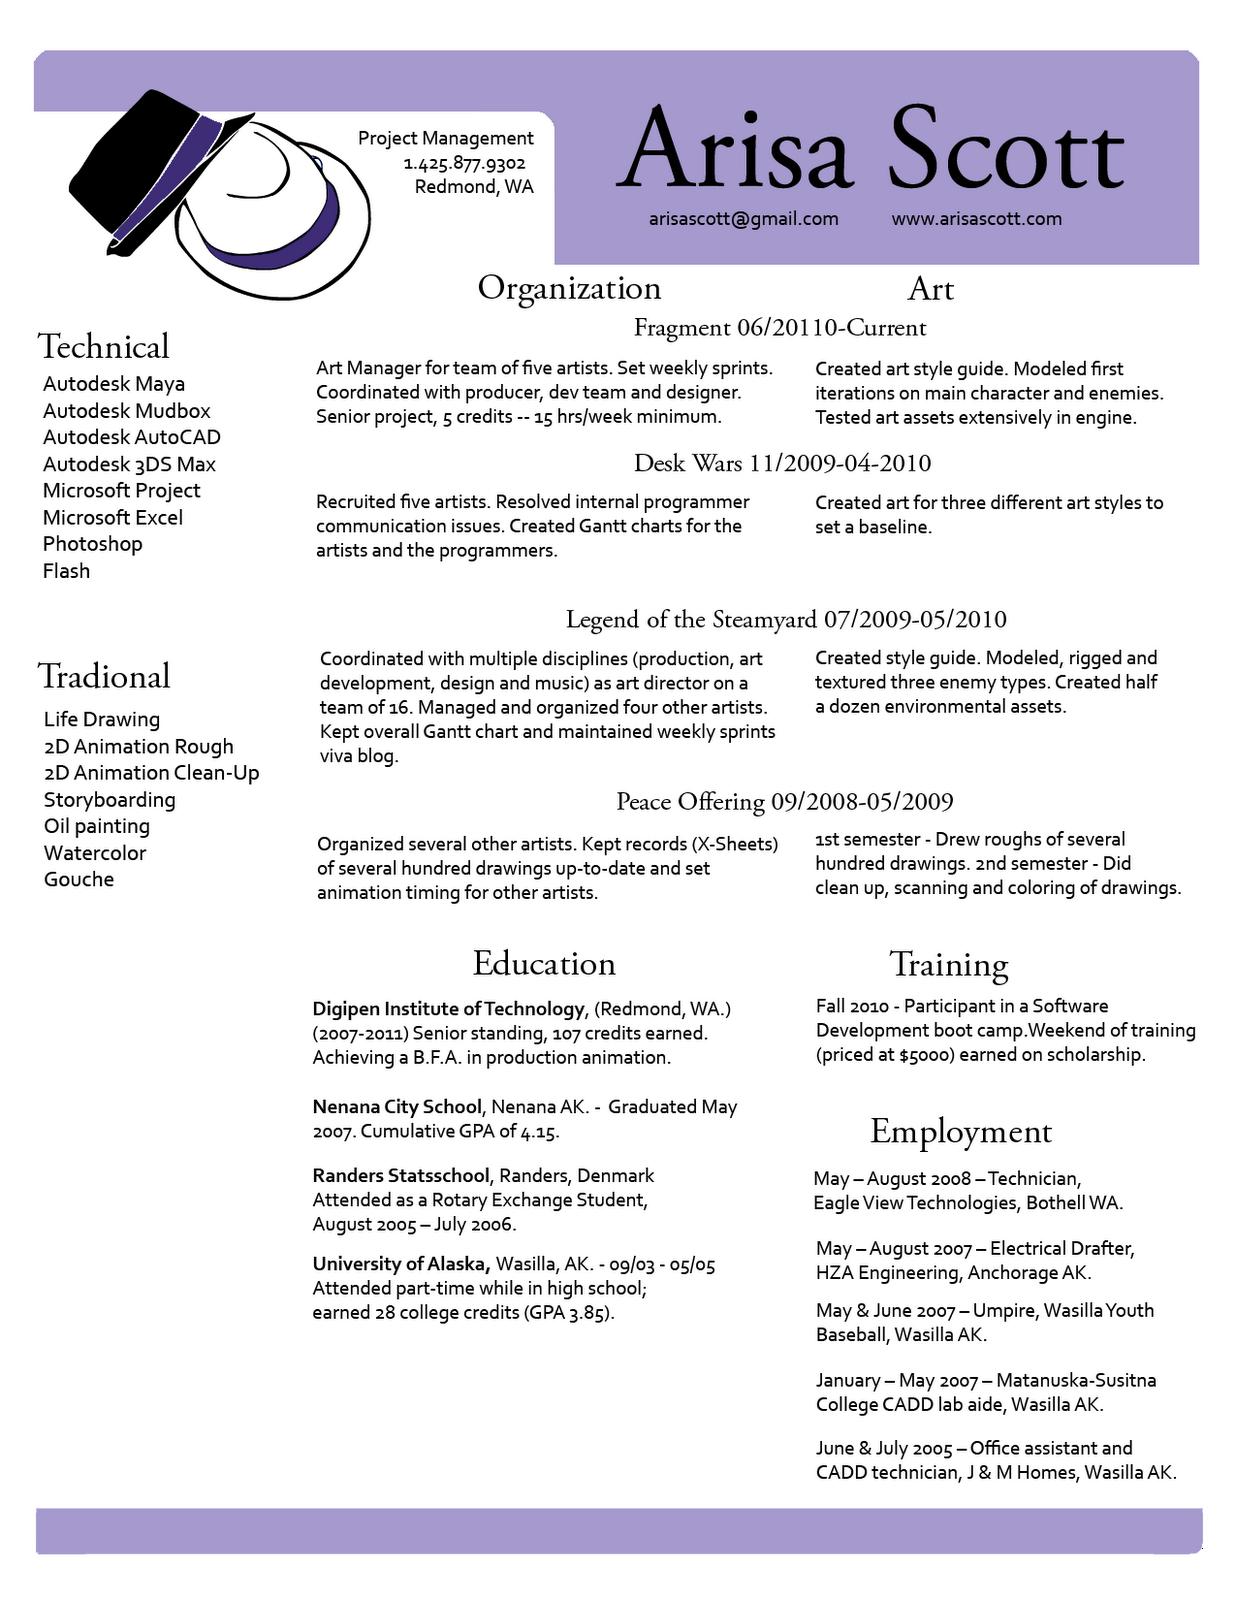 Top Resume builder free resume builder free resume builder seangarrette cob Top Resumes Top 10 Resume Mistakes